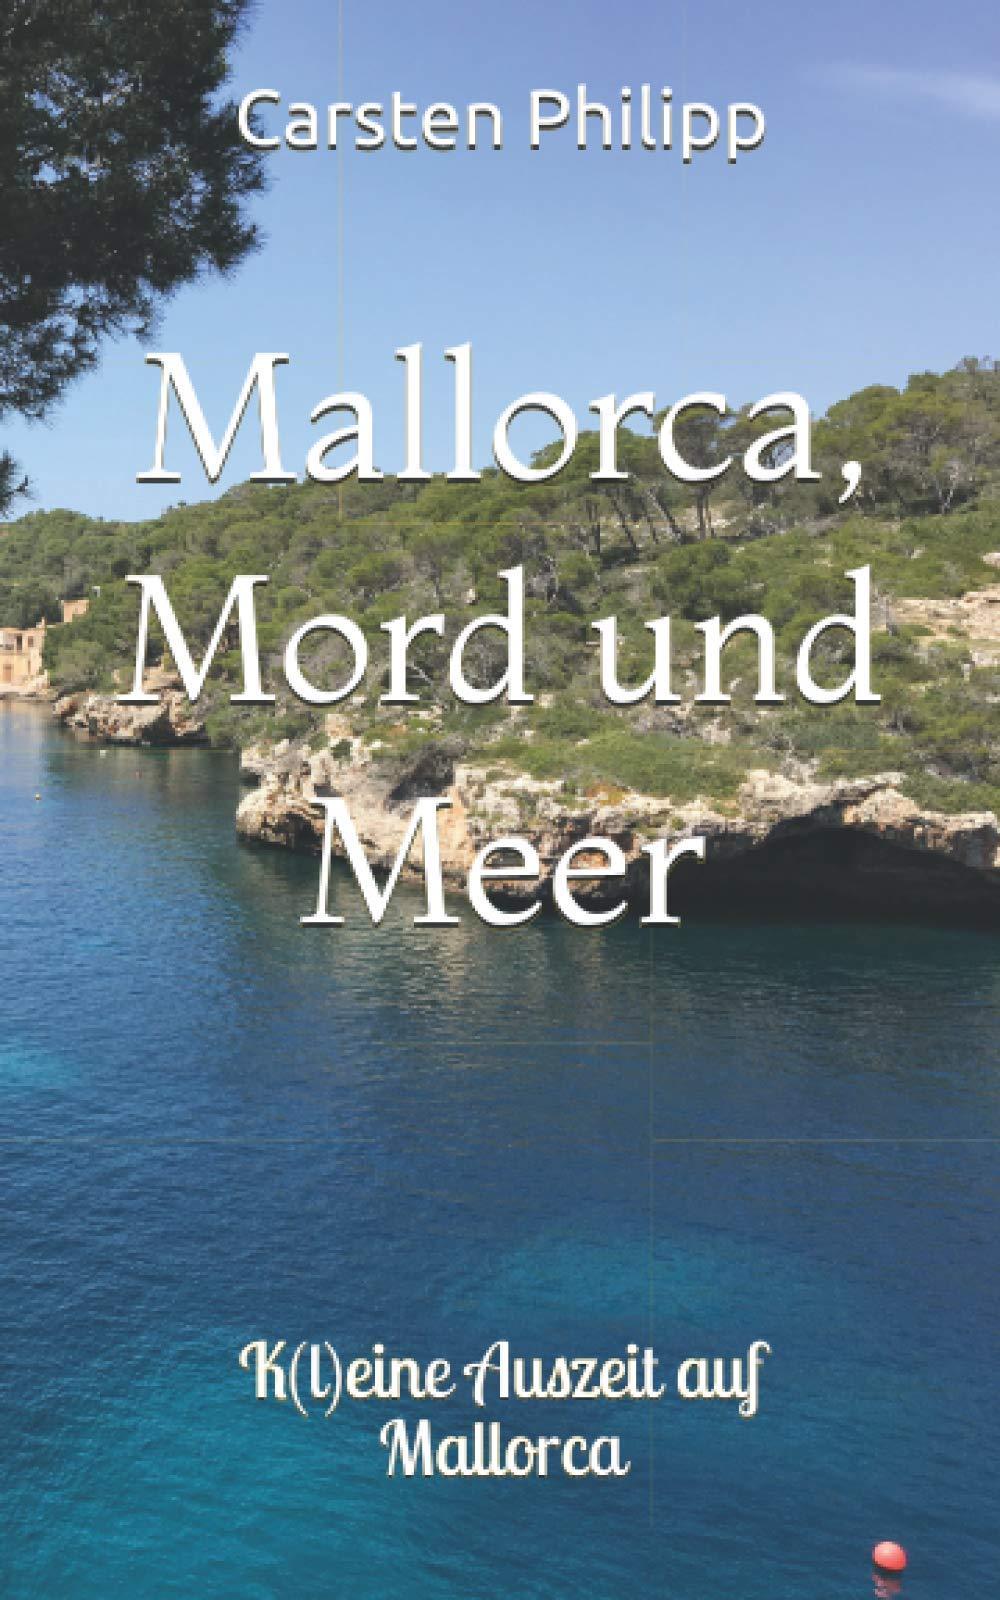 Mallorca, Mord und Meer